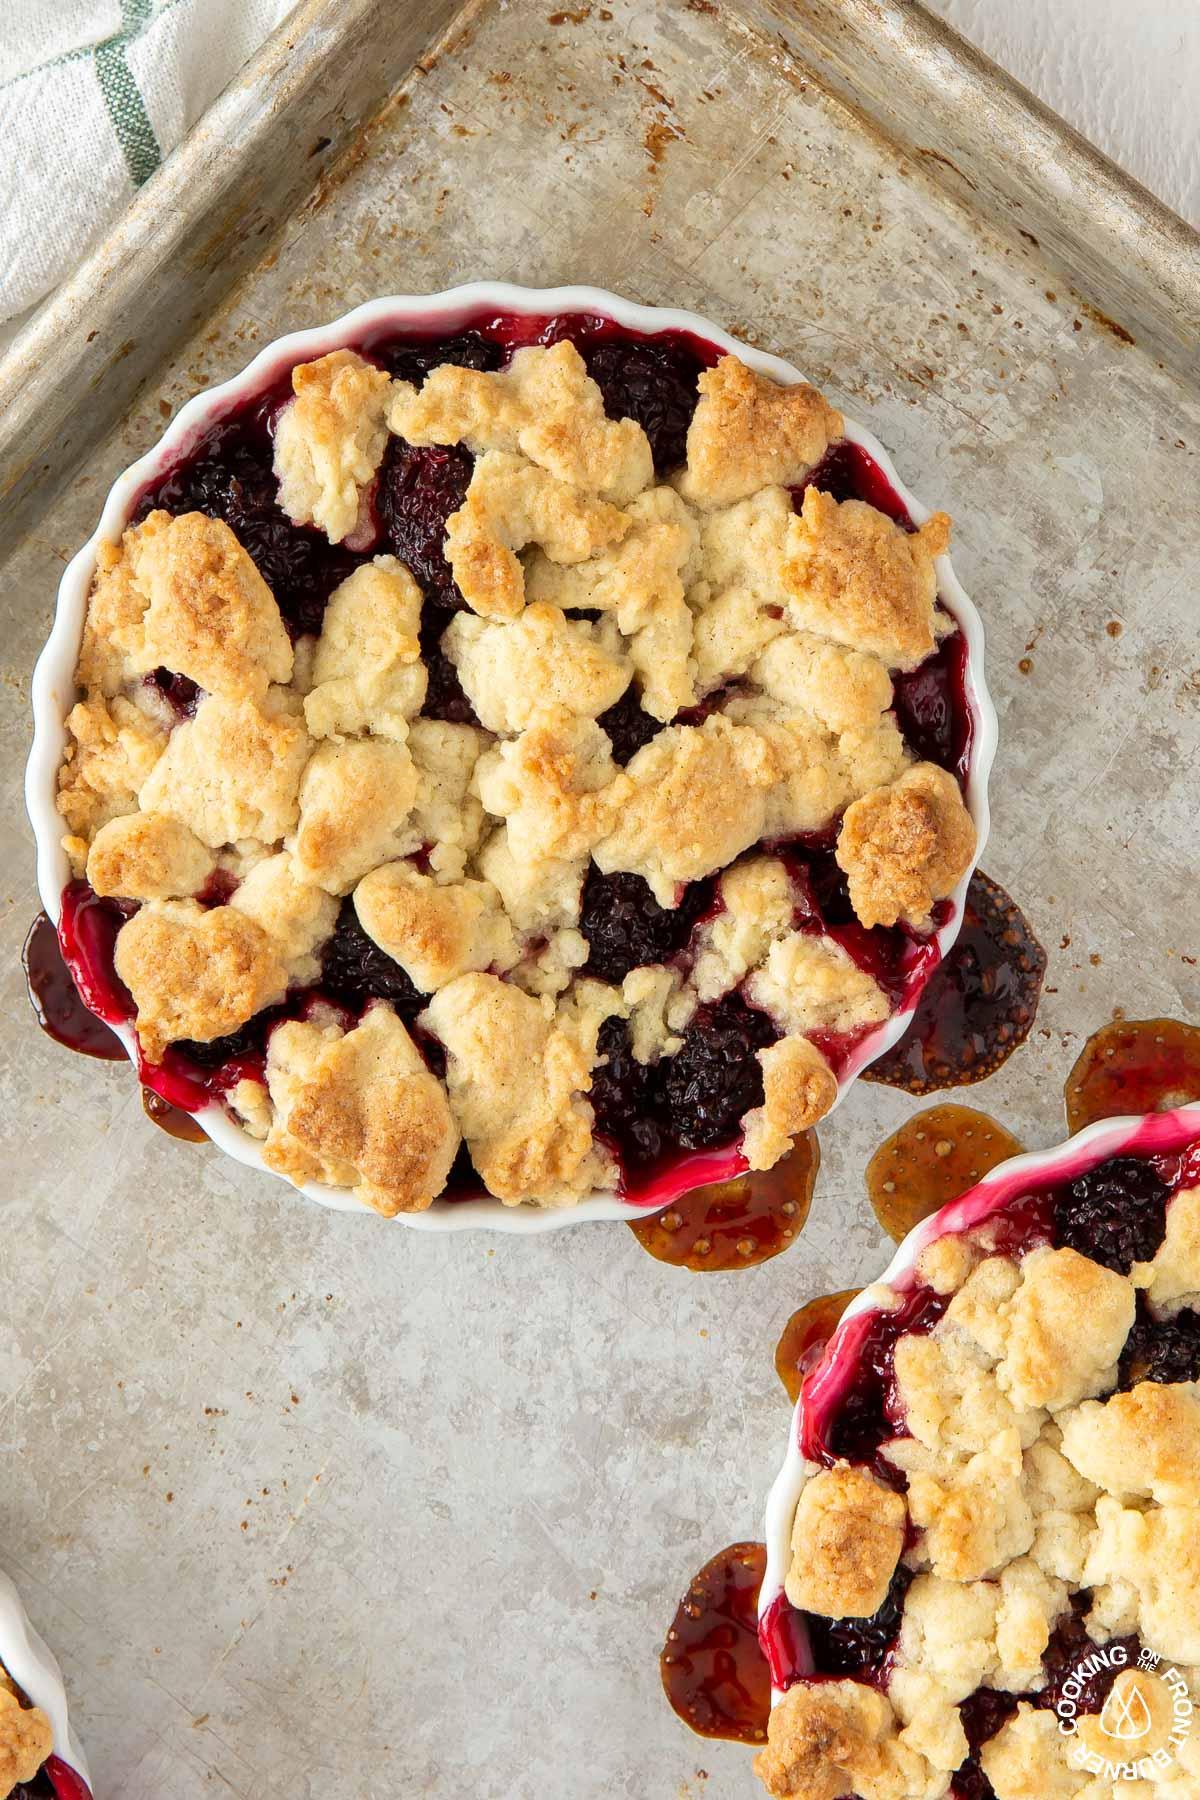 baked blackberry crumble tarts on a baking sheet